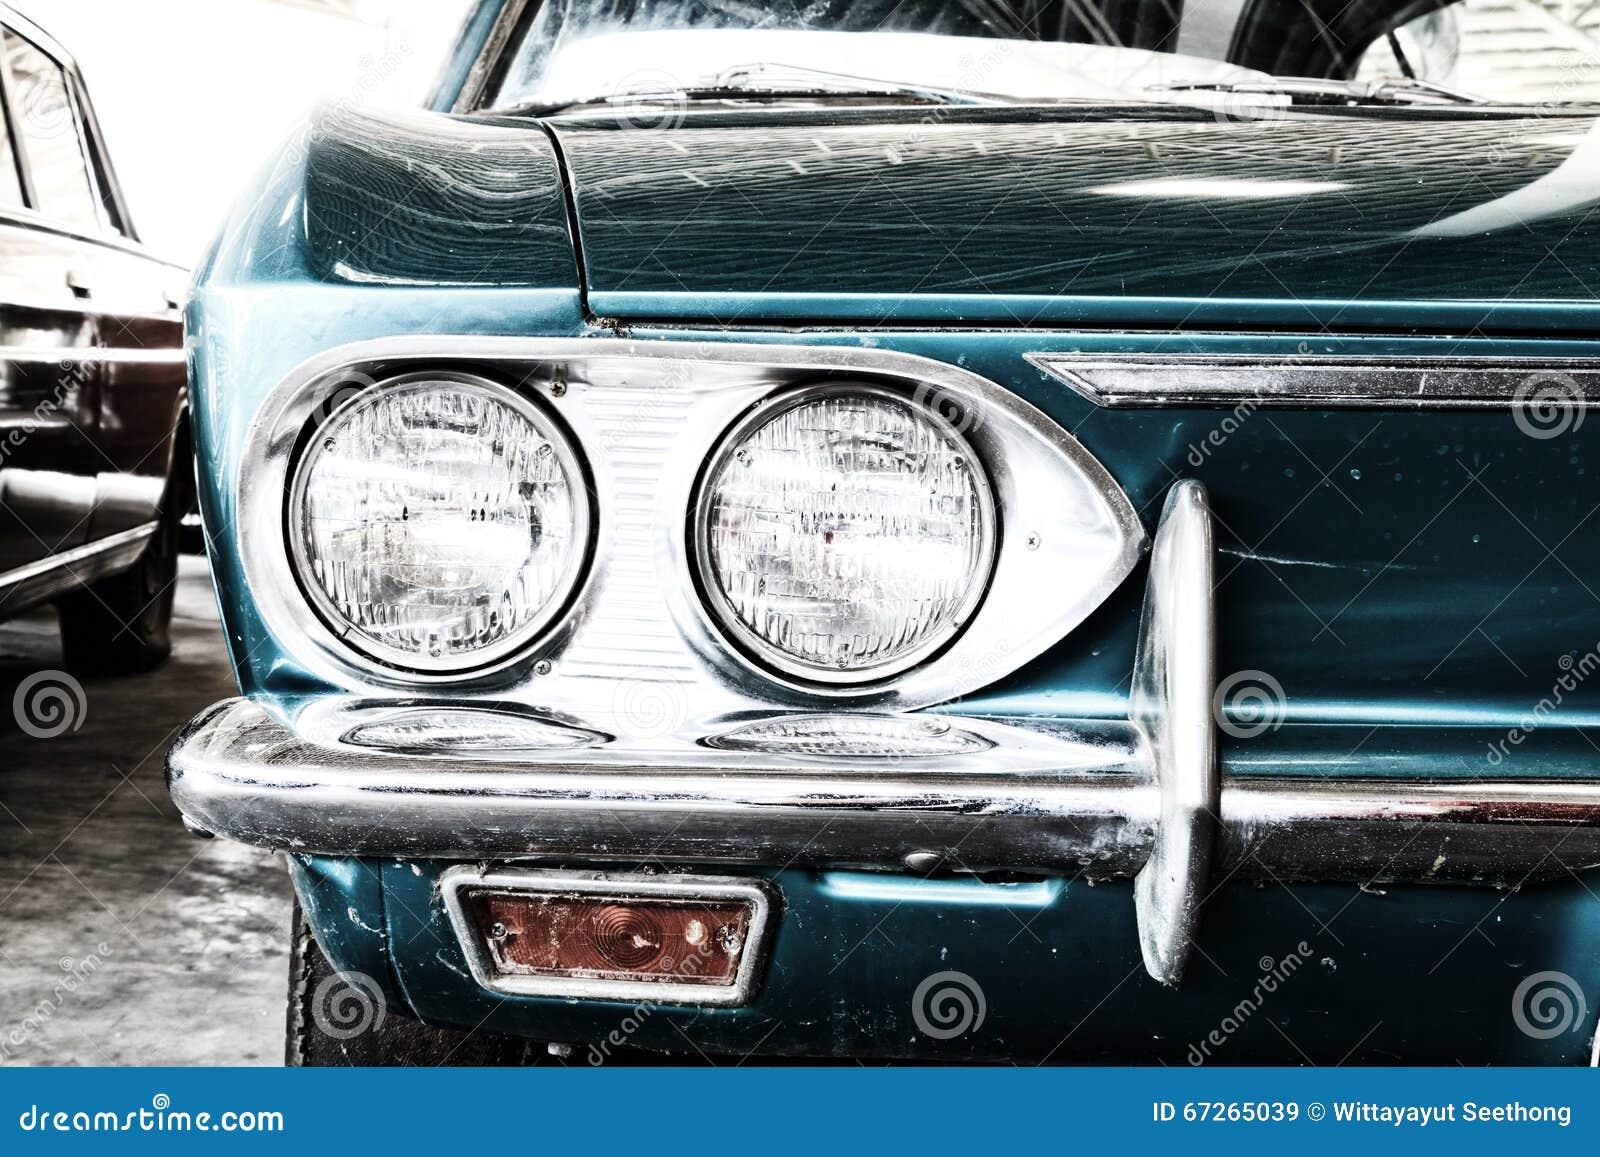 Vintage Auto Headlight Styles : Close up of headlight lamp vintage classic car royalty